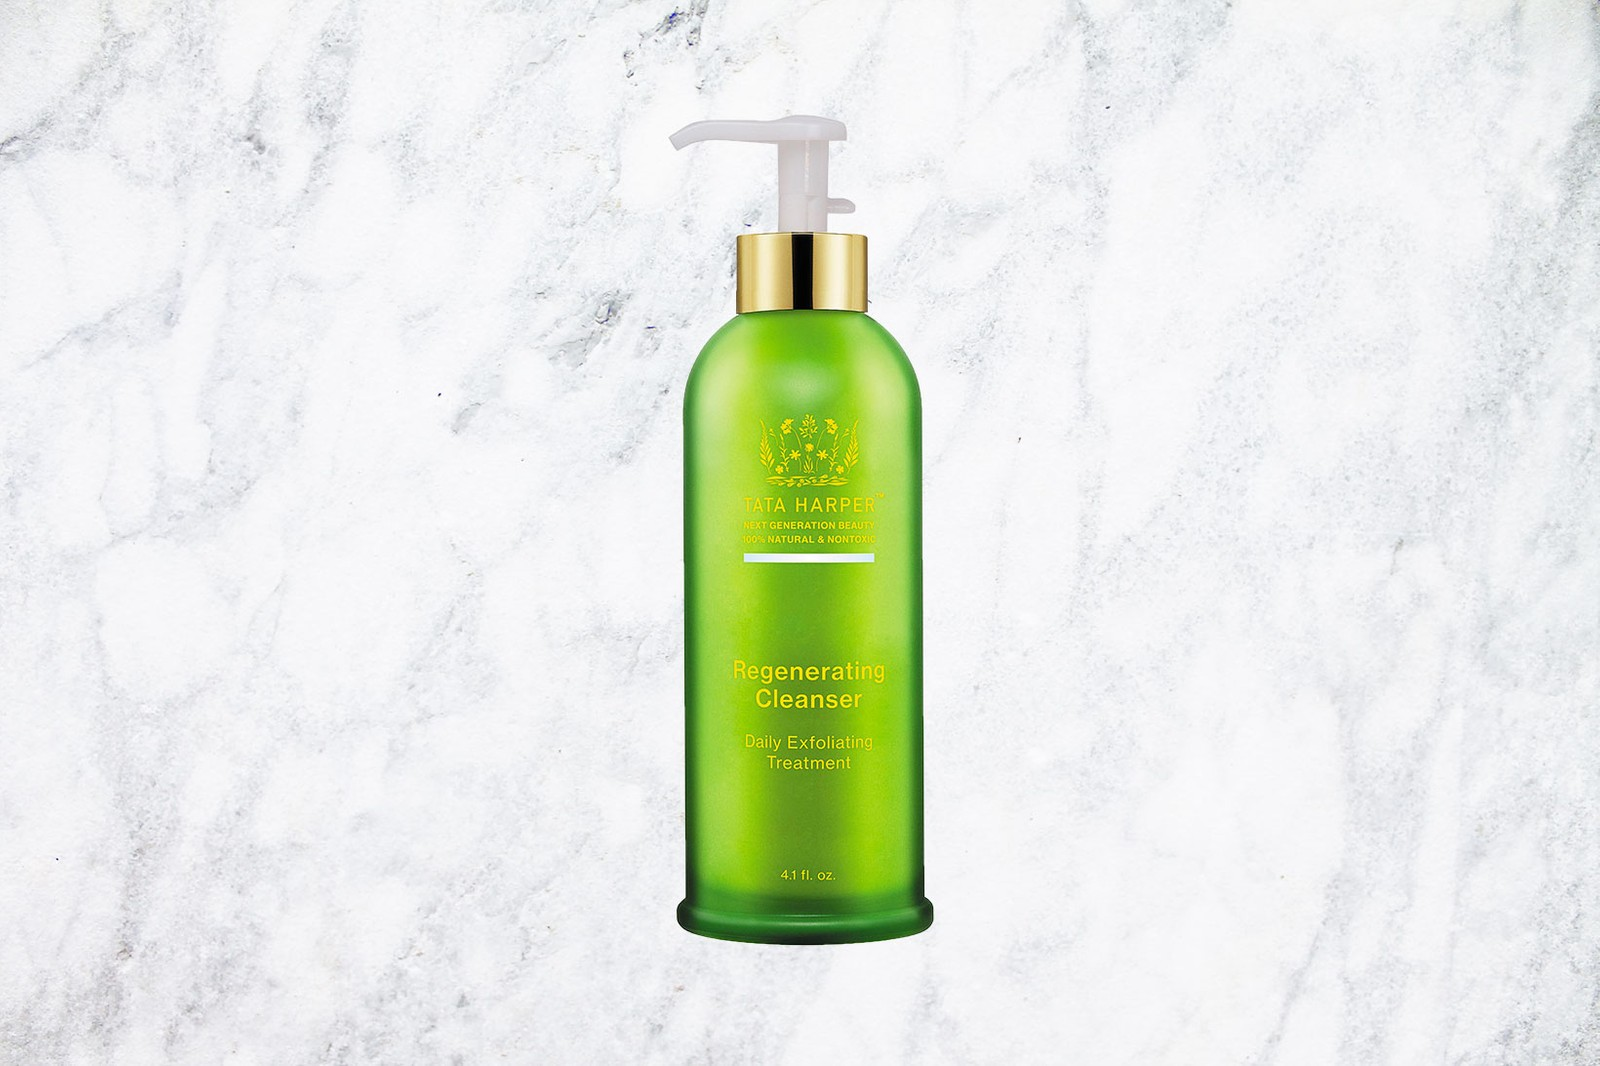 lane crawford clean beauty sustainability lianna man interview skincare wellness hong kong china